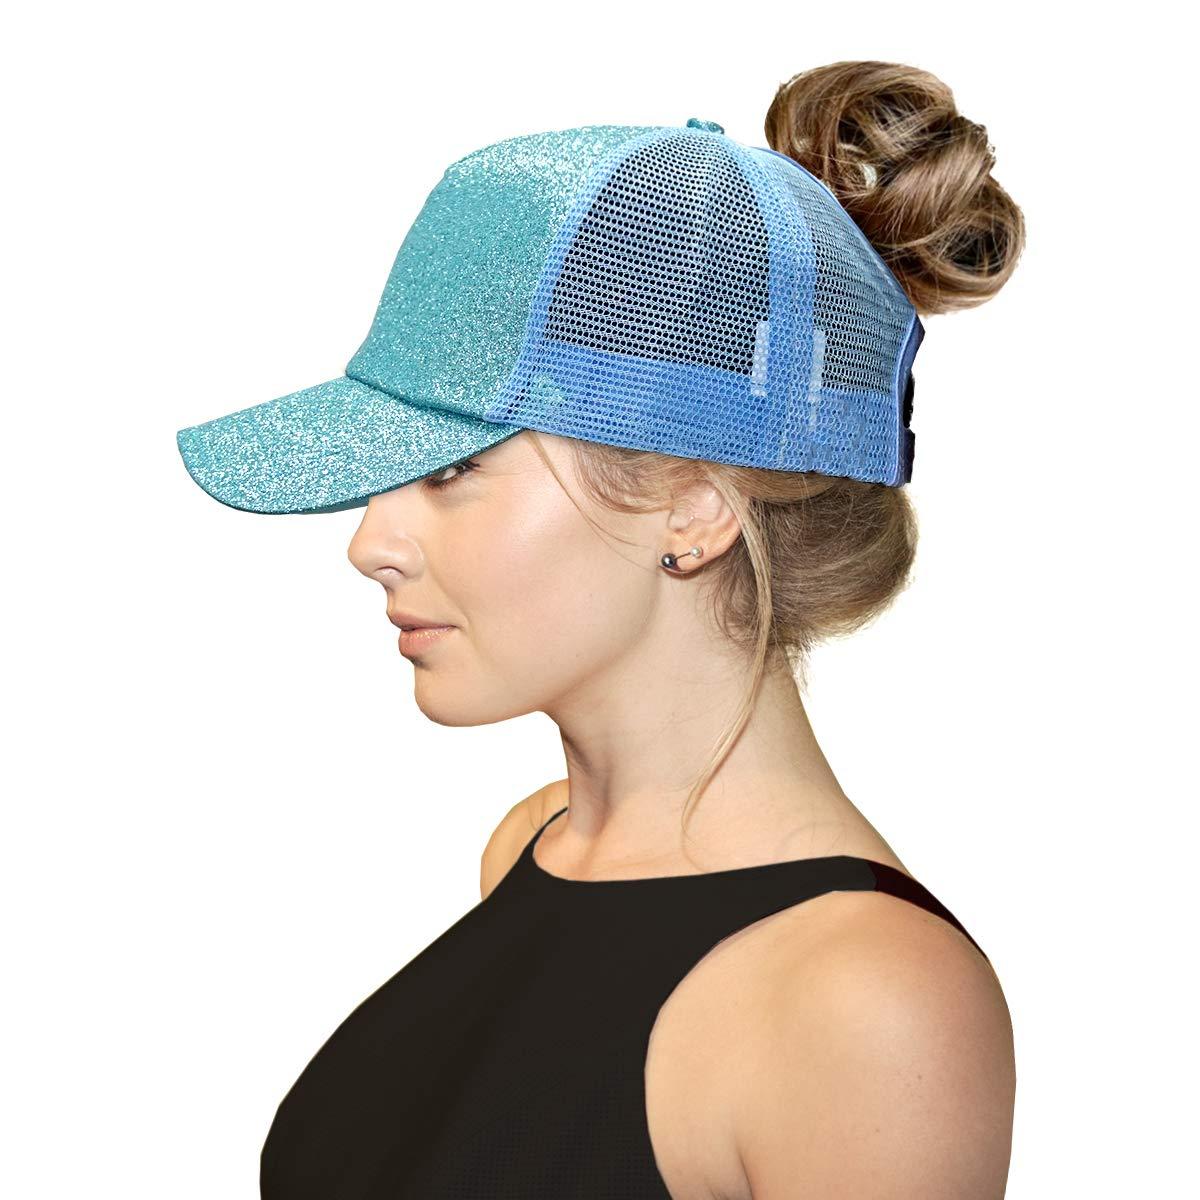 Amazon.com  ccbeanie Ponycap Messy High Bun Ponytail Glitter Mesh Trucker  Baseball Cap Ponytail Hats for Women Girl Running Visor Hats  Clothing 5e2ce0d48c5